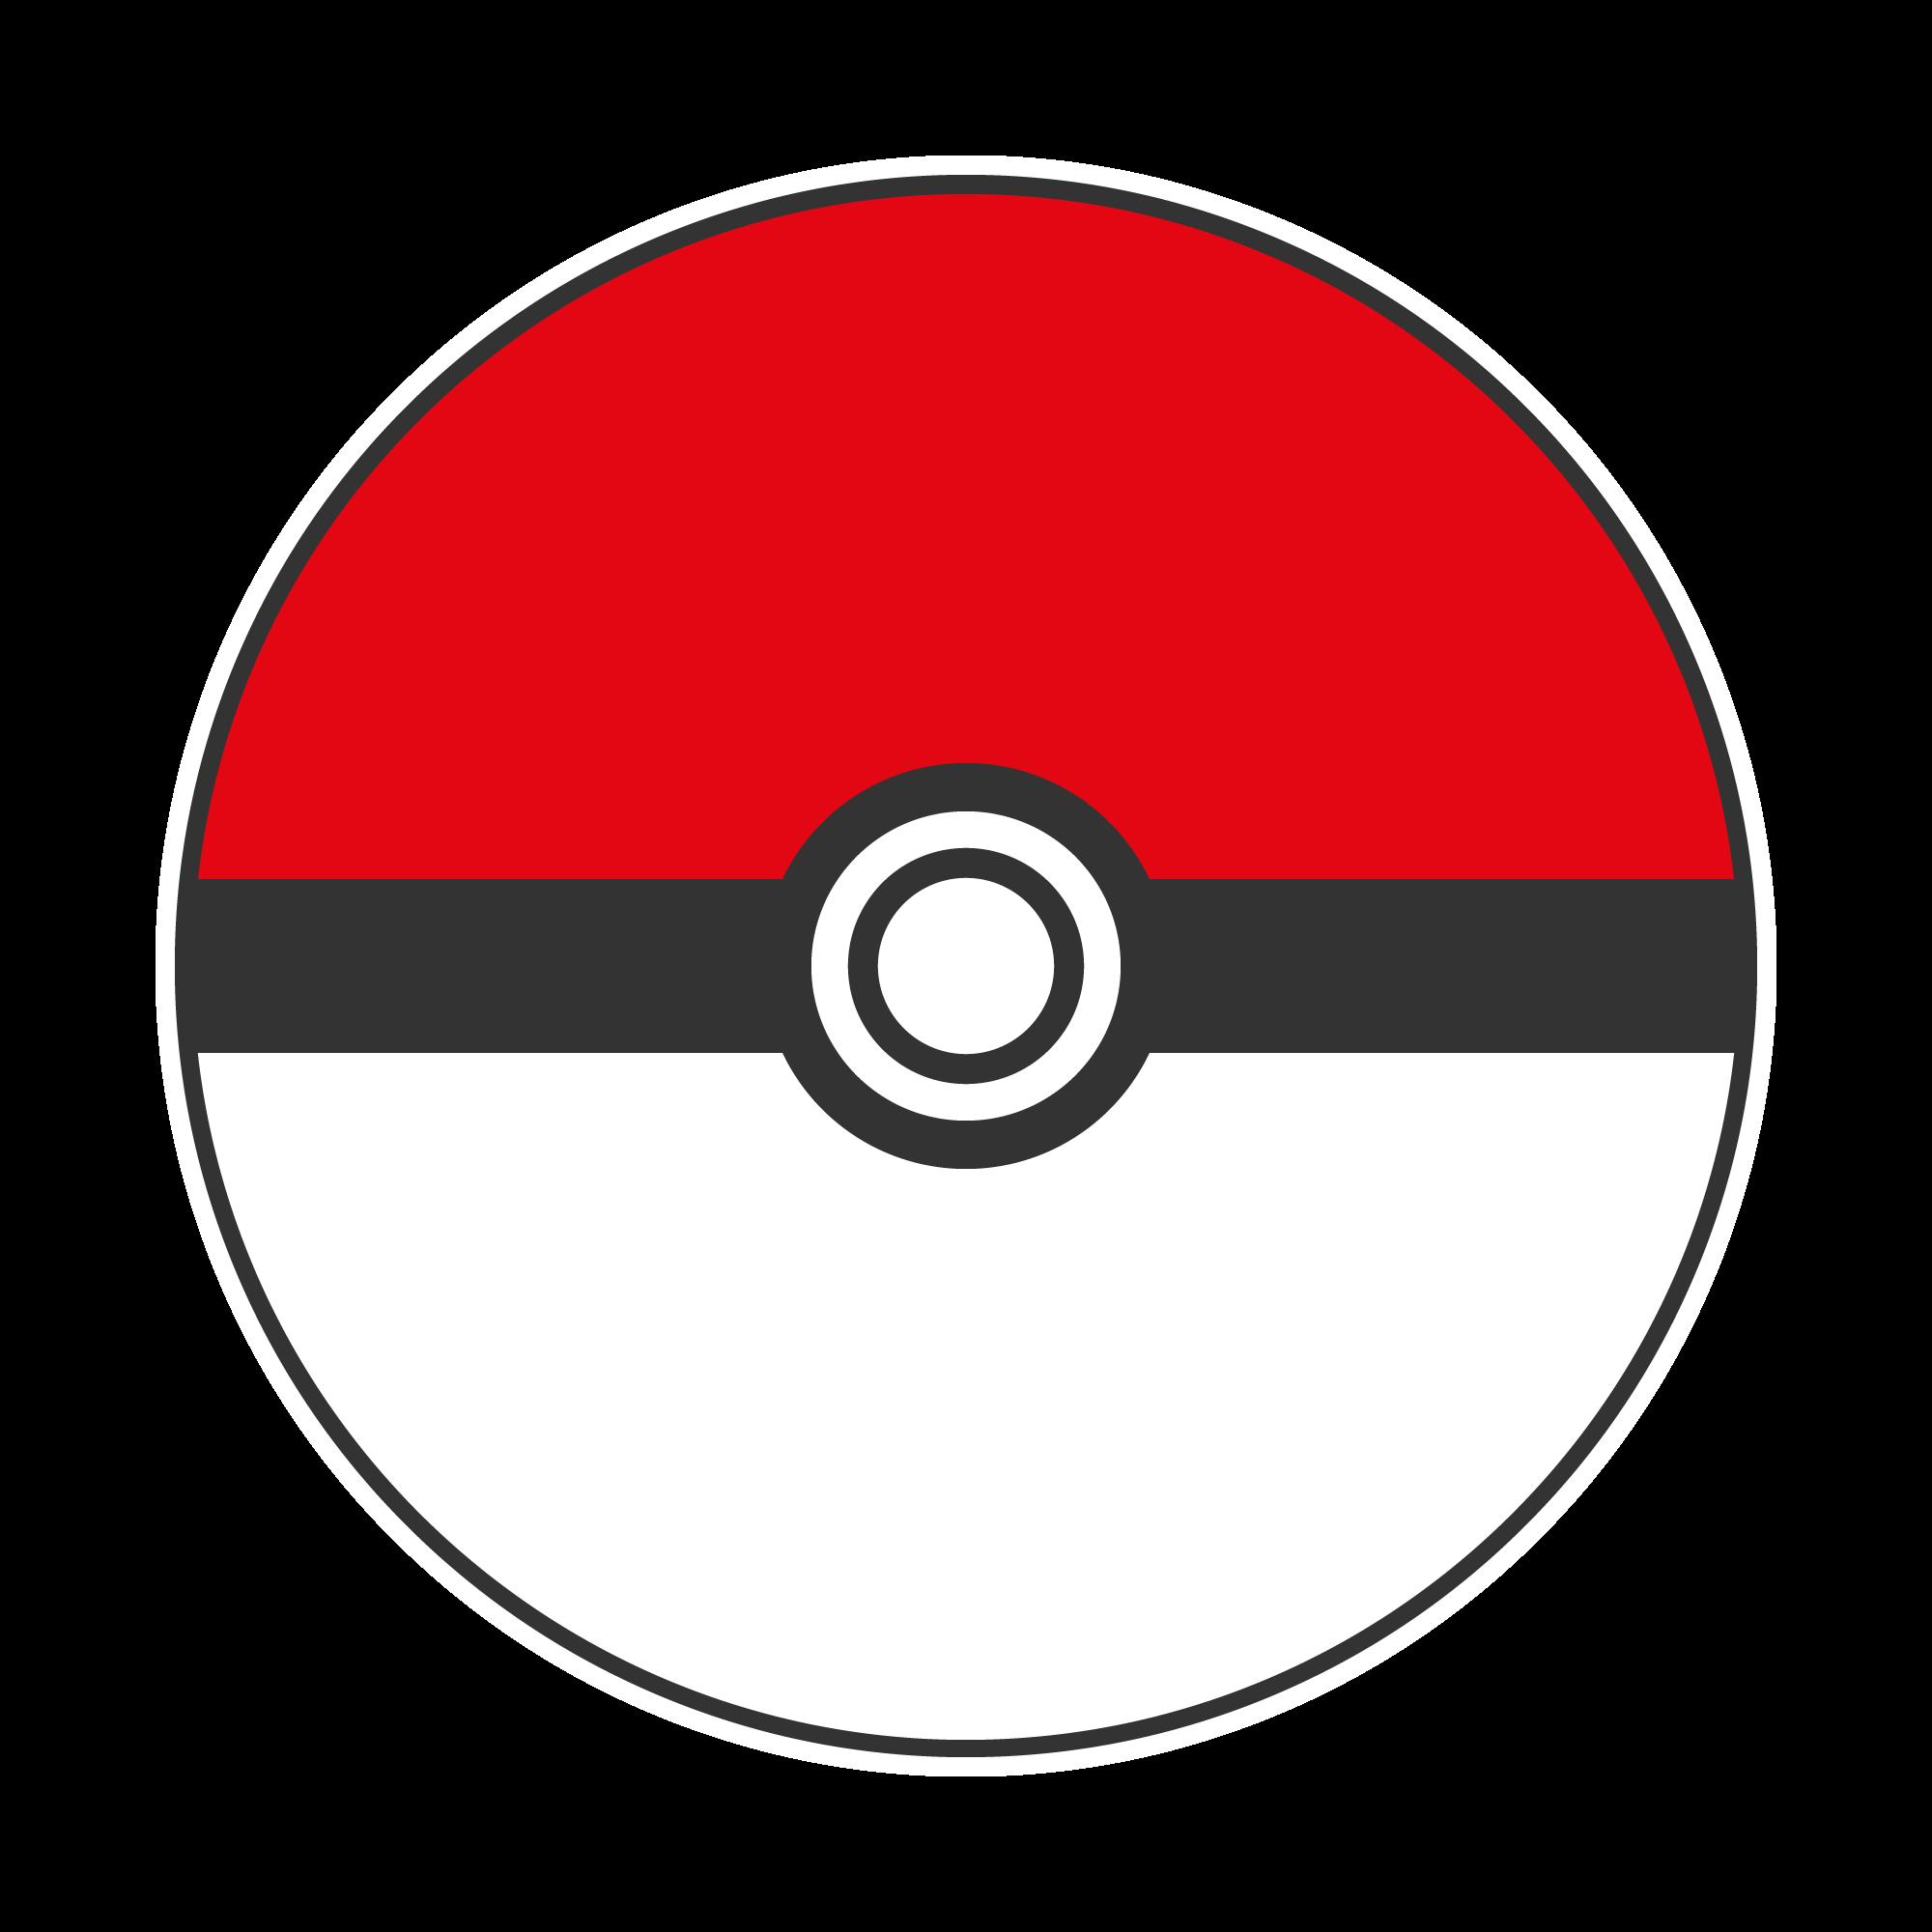 Pokemon ball red free. Pokeball clipart cool